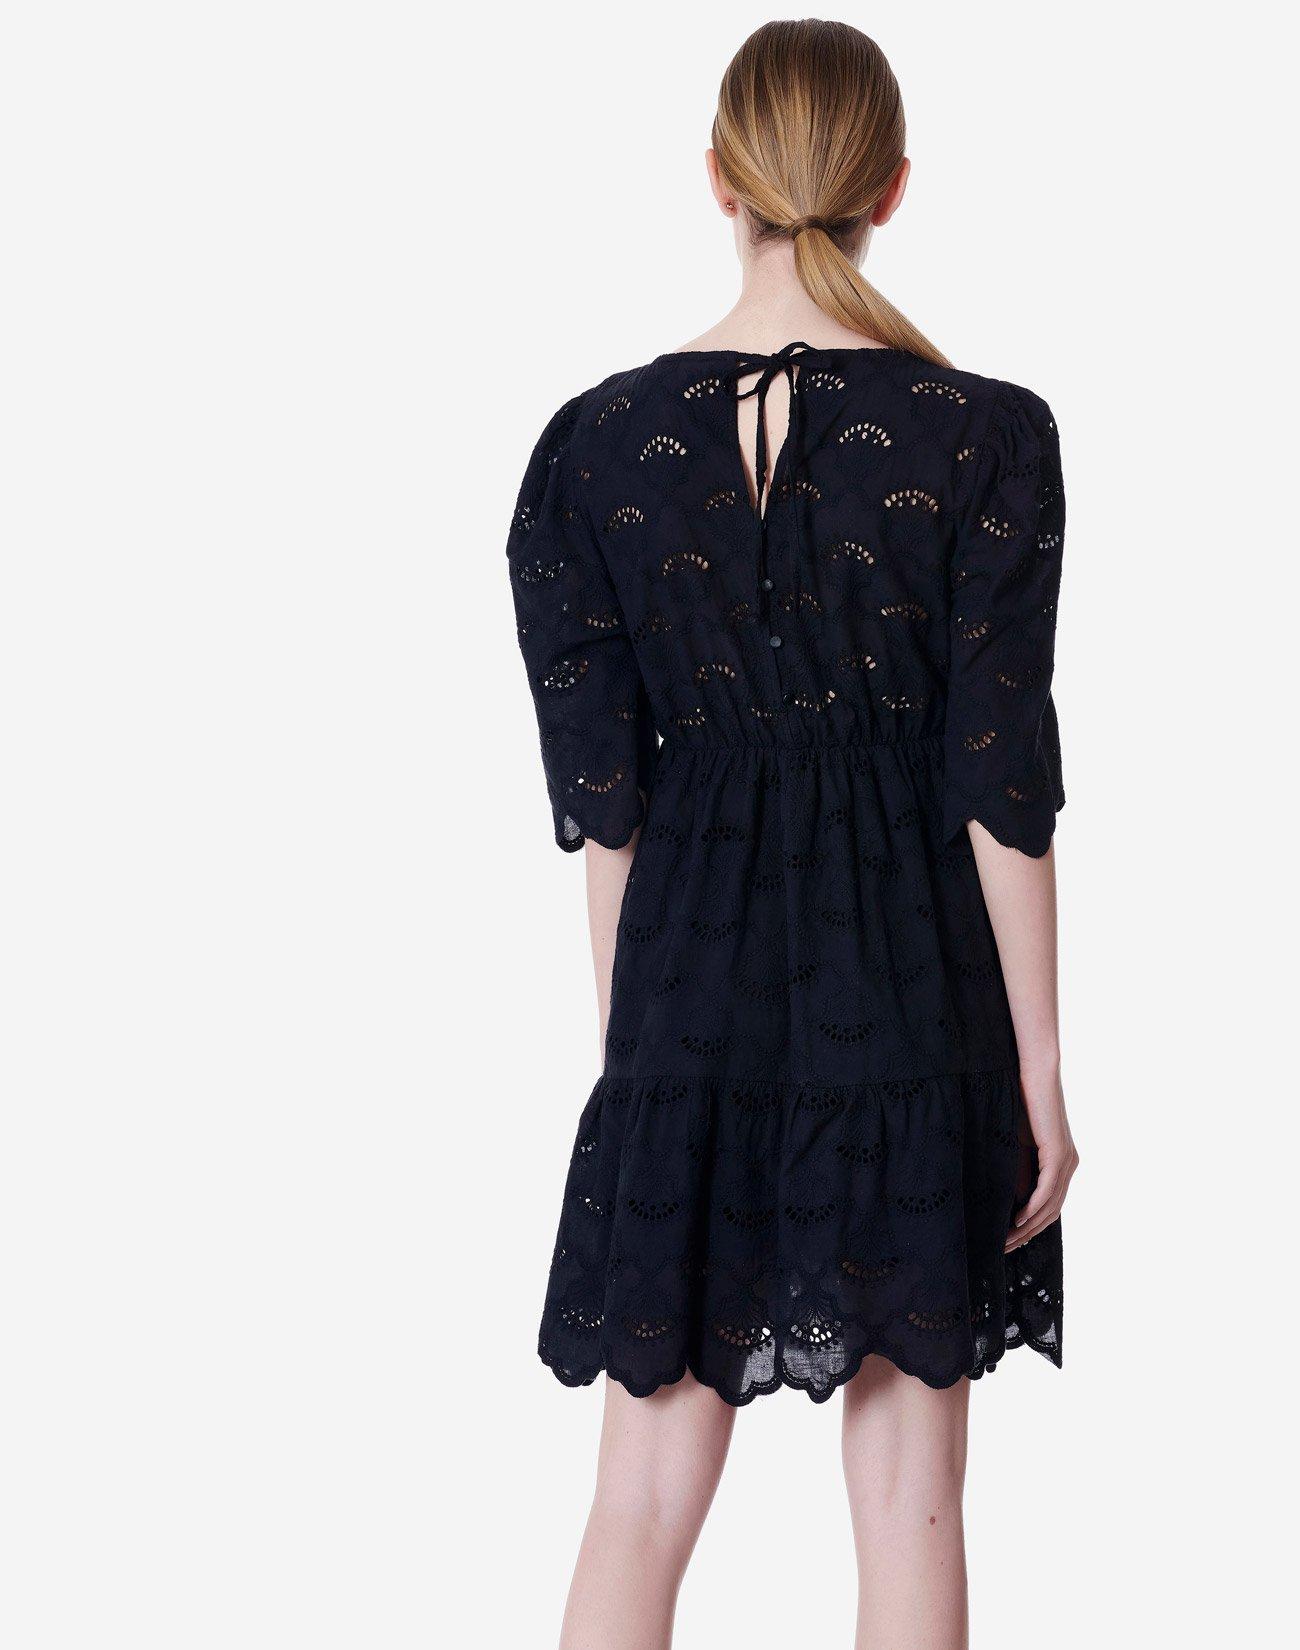 Mini dress with cutwork detail